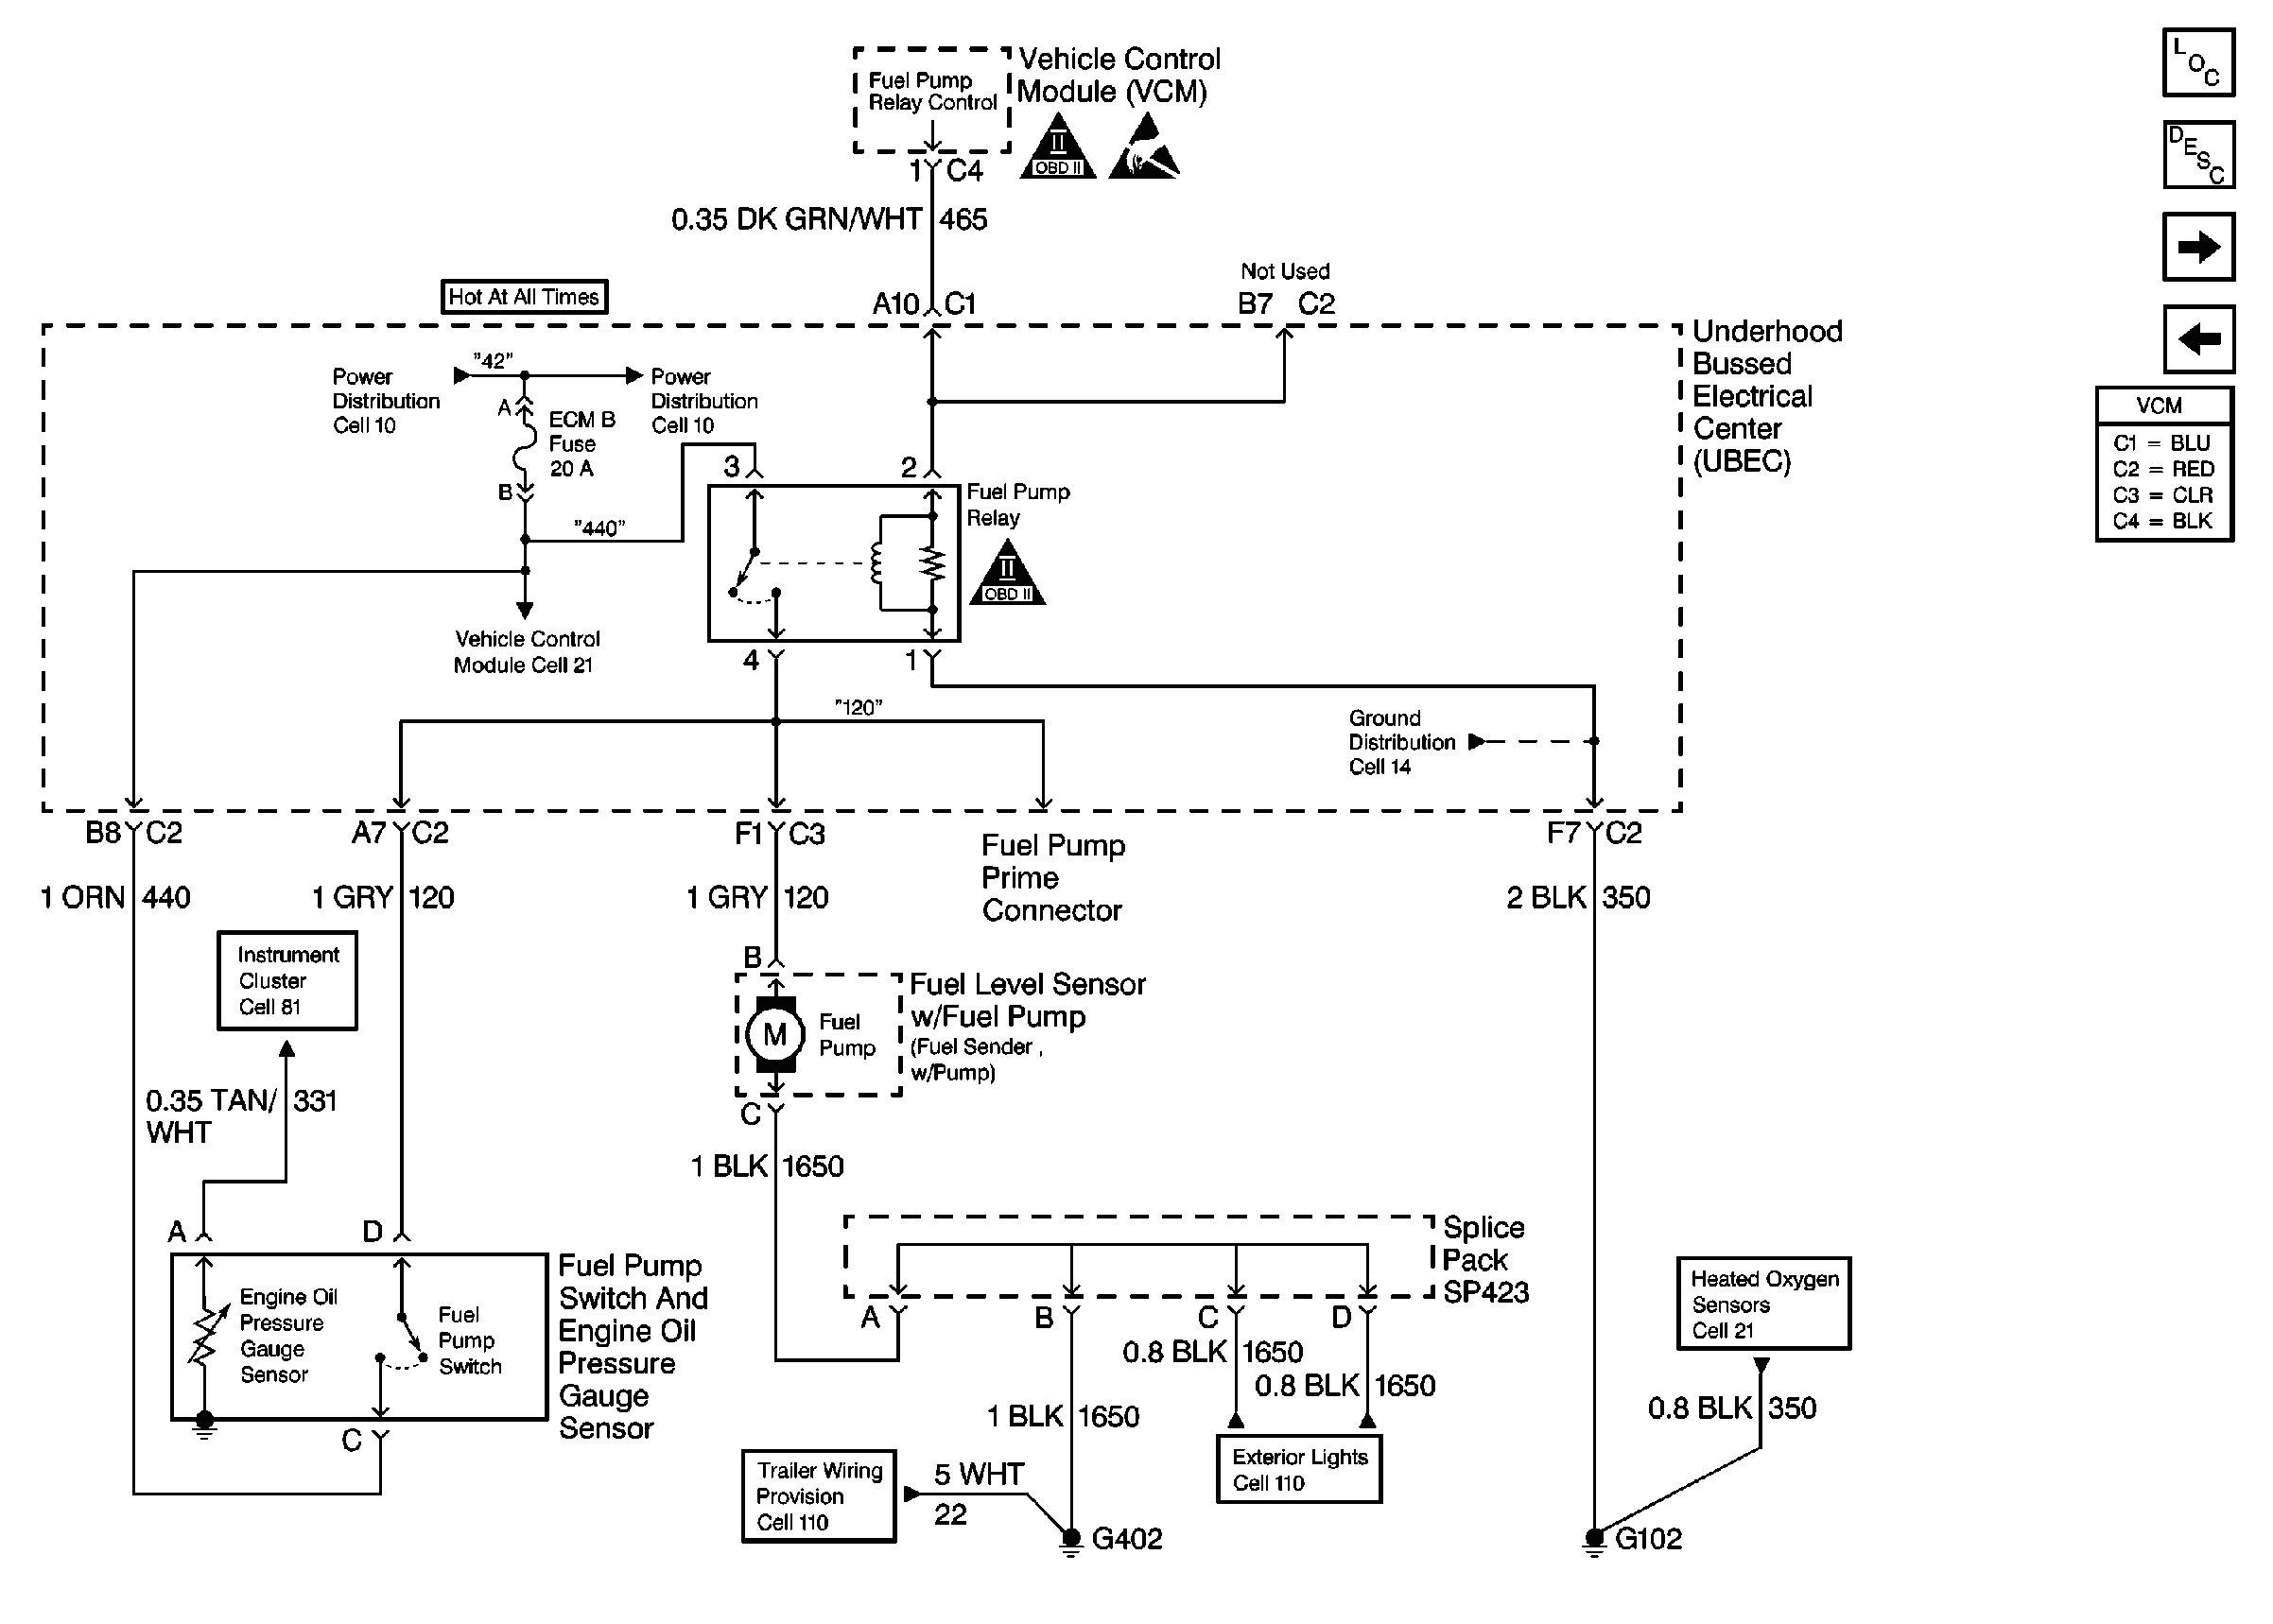 95 Grand Am Alternator Wiring Diagram Schematic Diagrams Pontiac 1995 Camaro Fuel Pump Electricity 2004 Prix Fuse